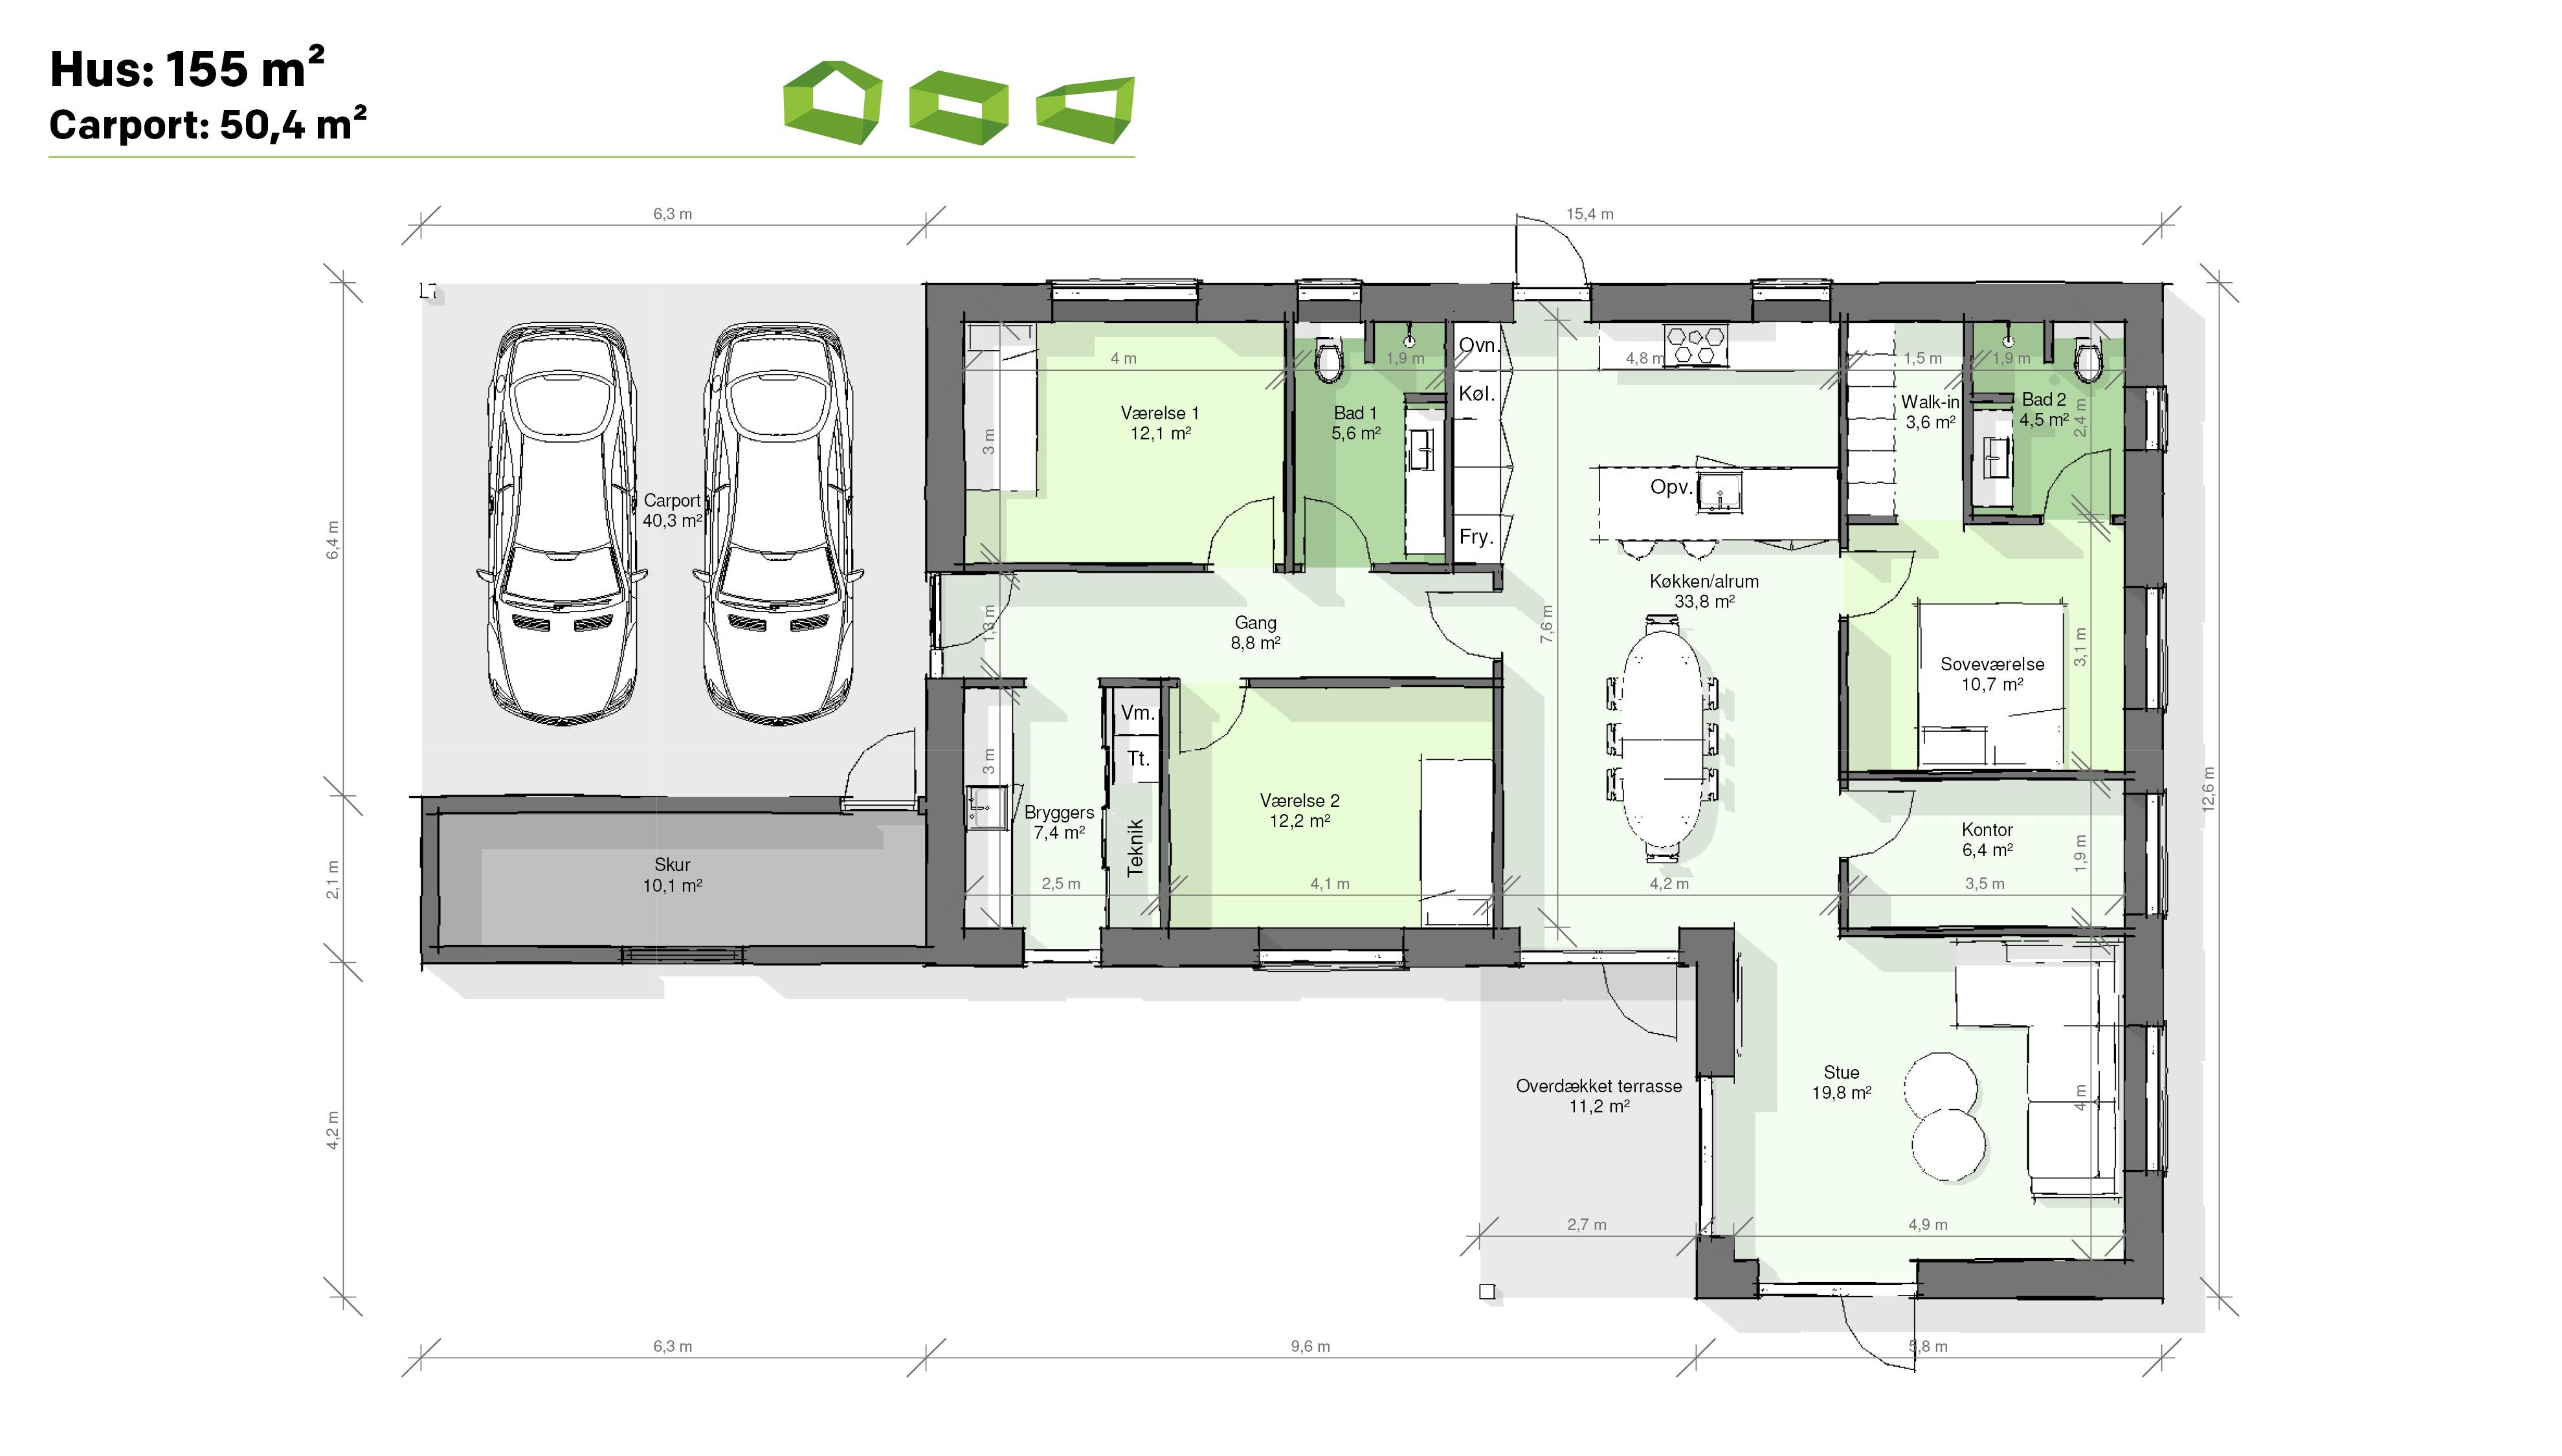 plantegning vinkelhus 155 m2